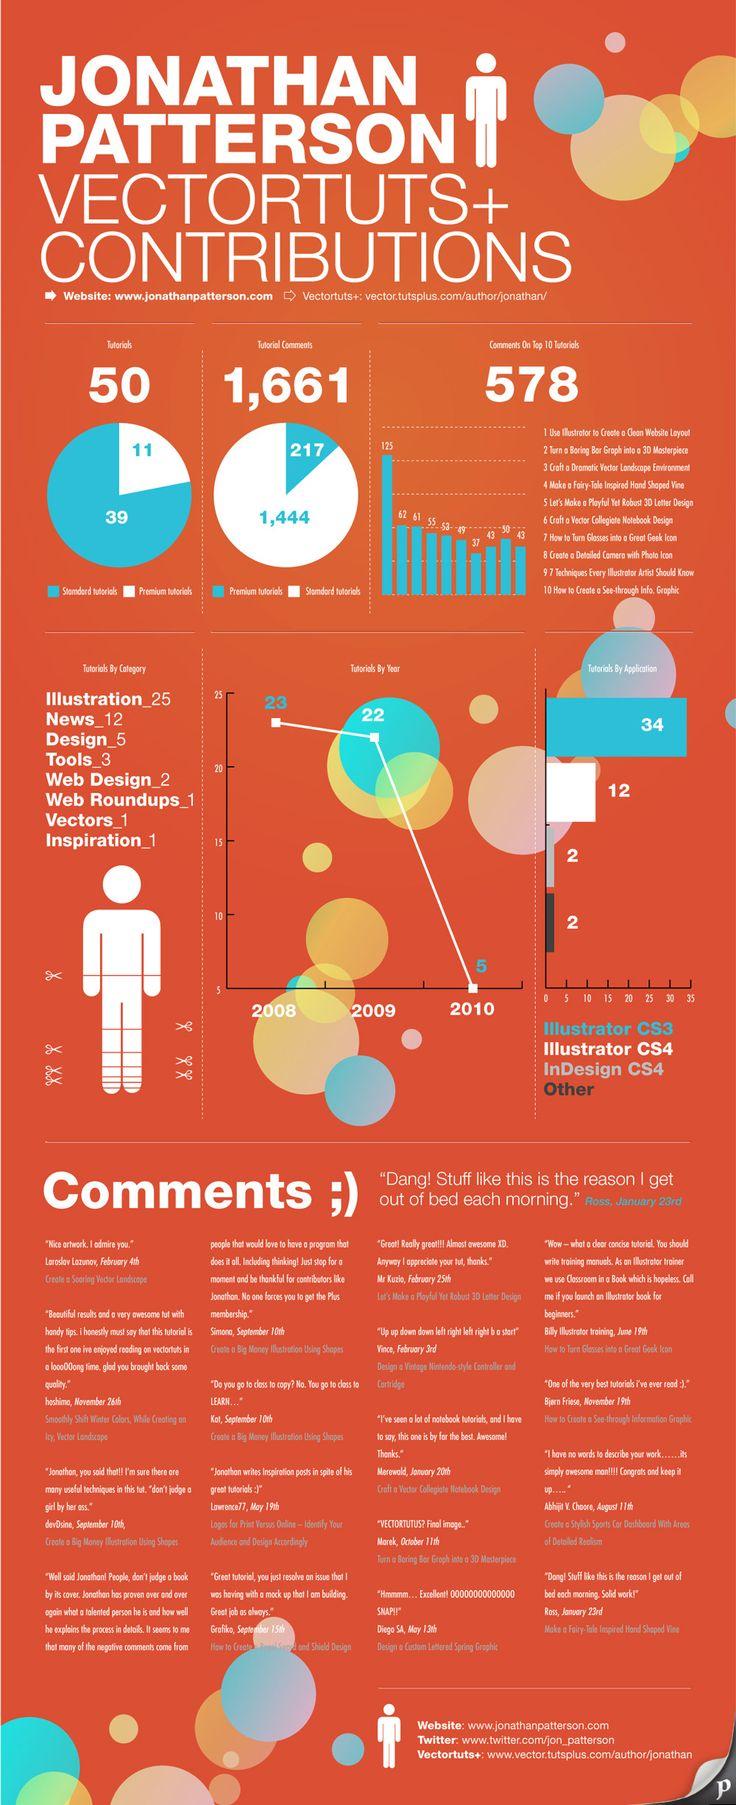 17 Best Images About Graphic Design Tutorials On Pinterest